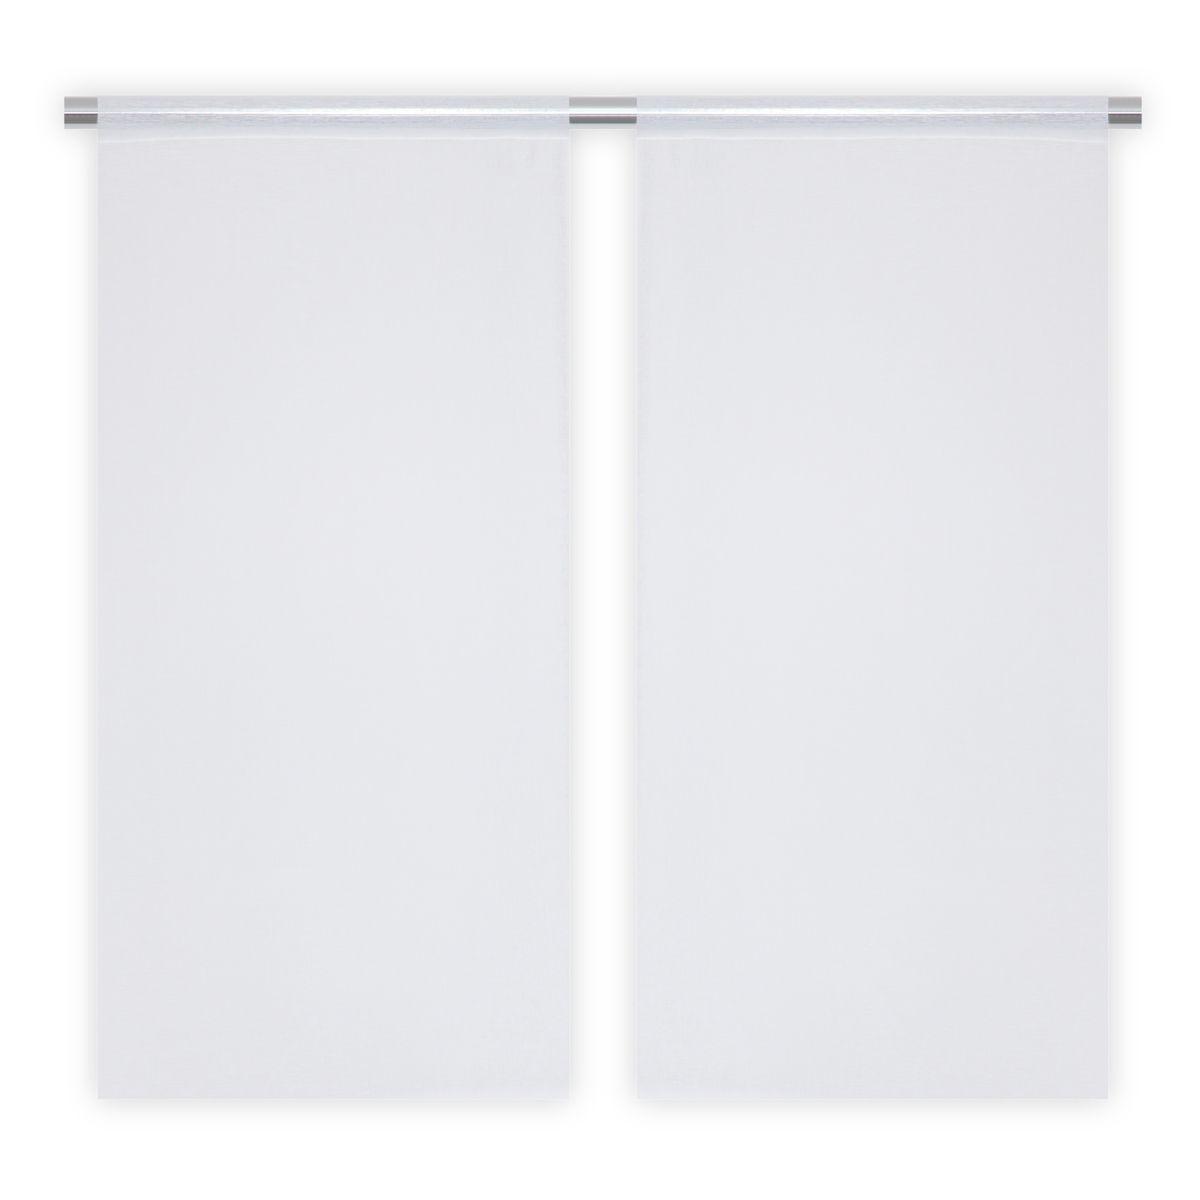 Vitrage droit blanc Tepic 60x120 cm